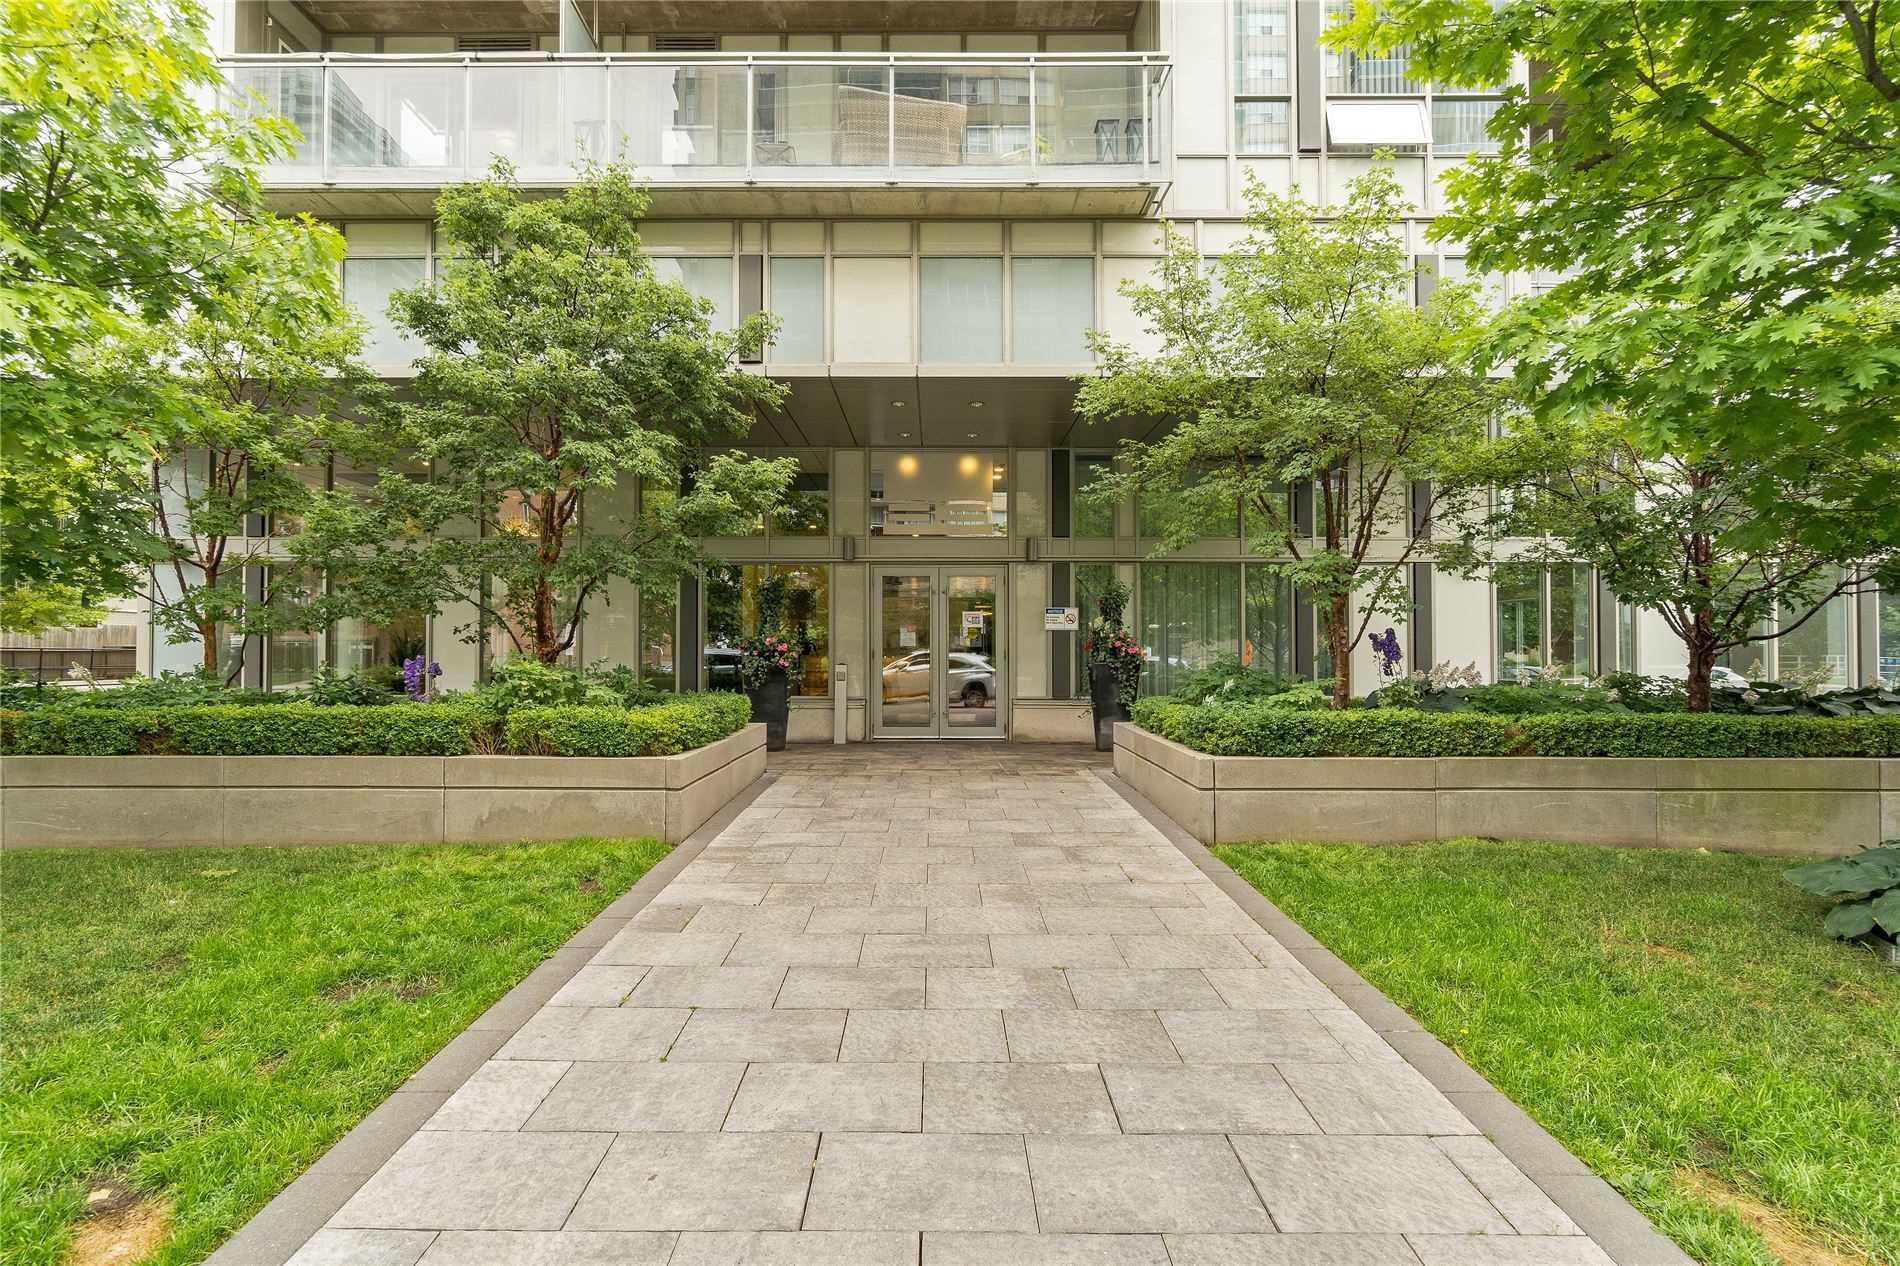 1505 - 83 Redpath Ave - Mount Pleasant West Condo Apt for sale, 1 Bedroom (C5325031) - #1